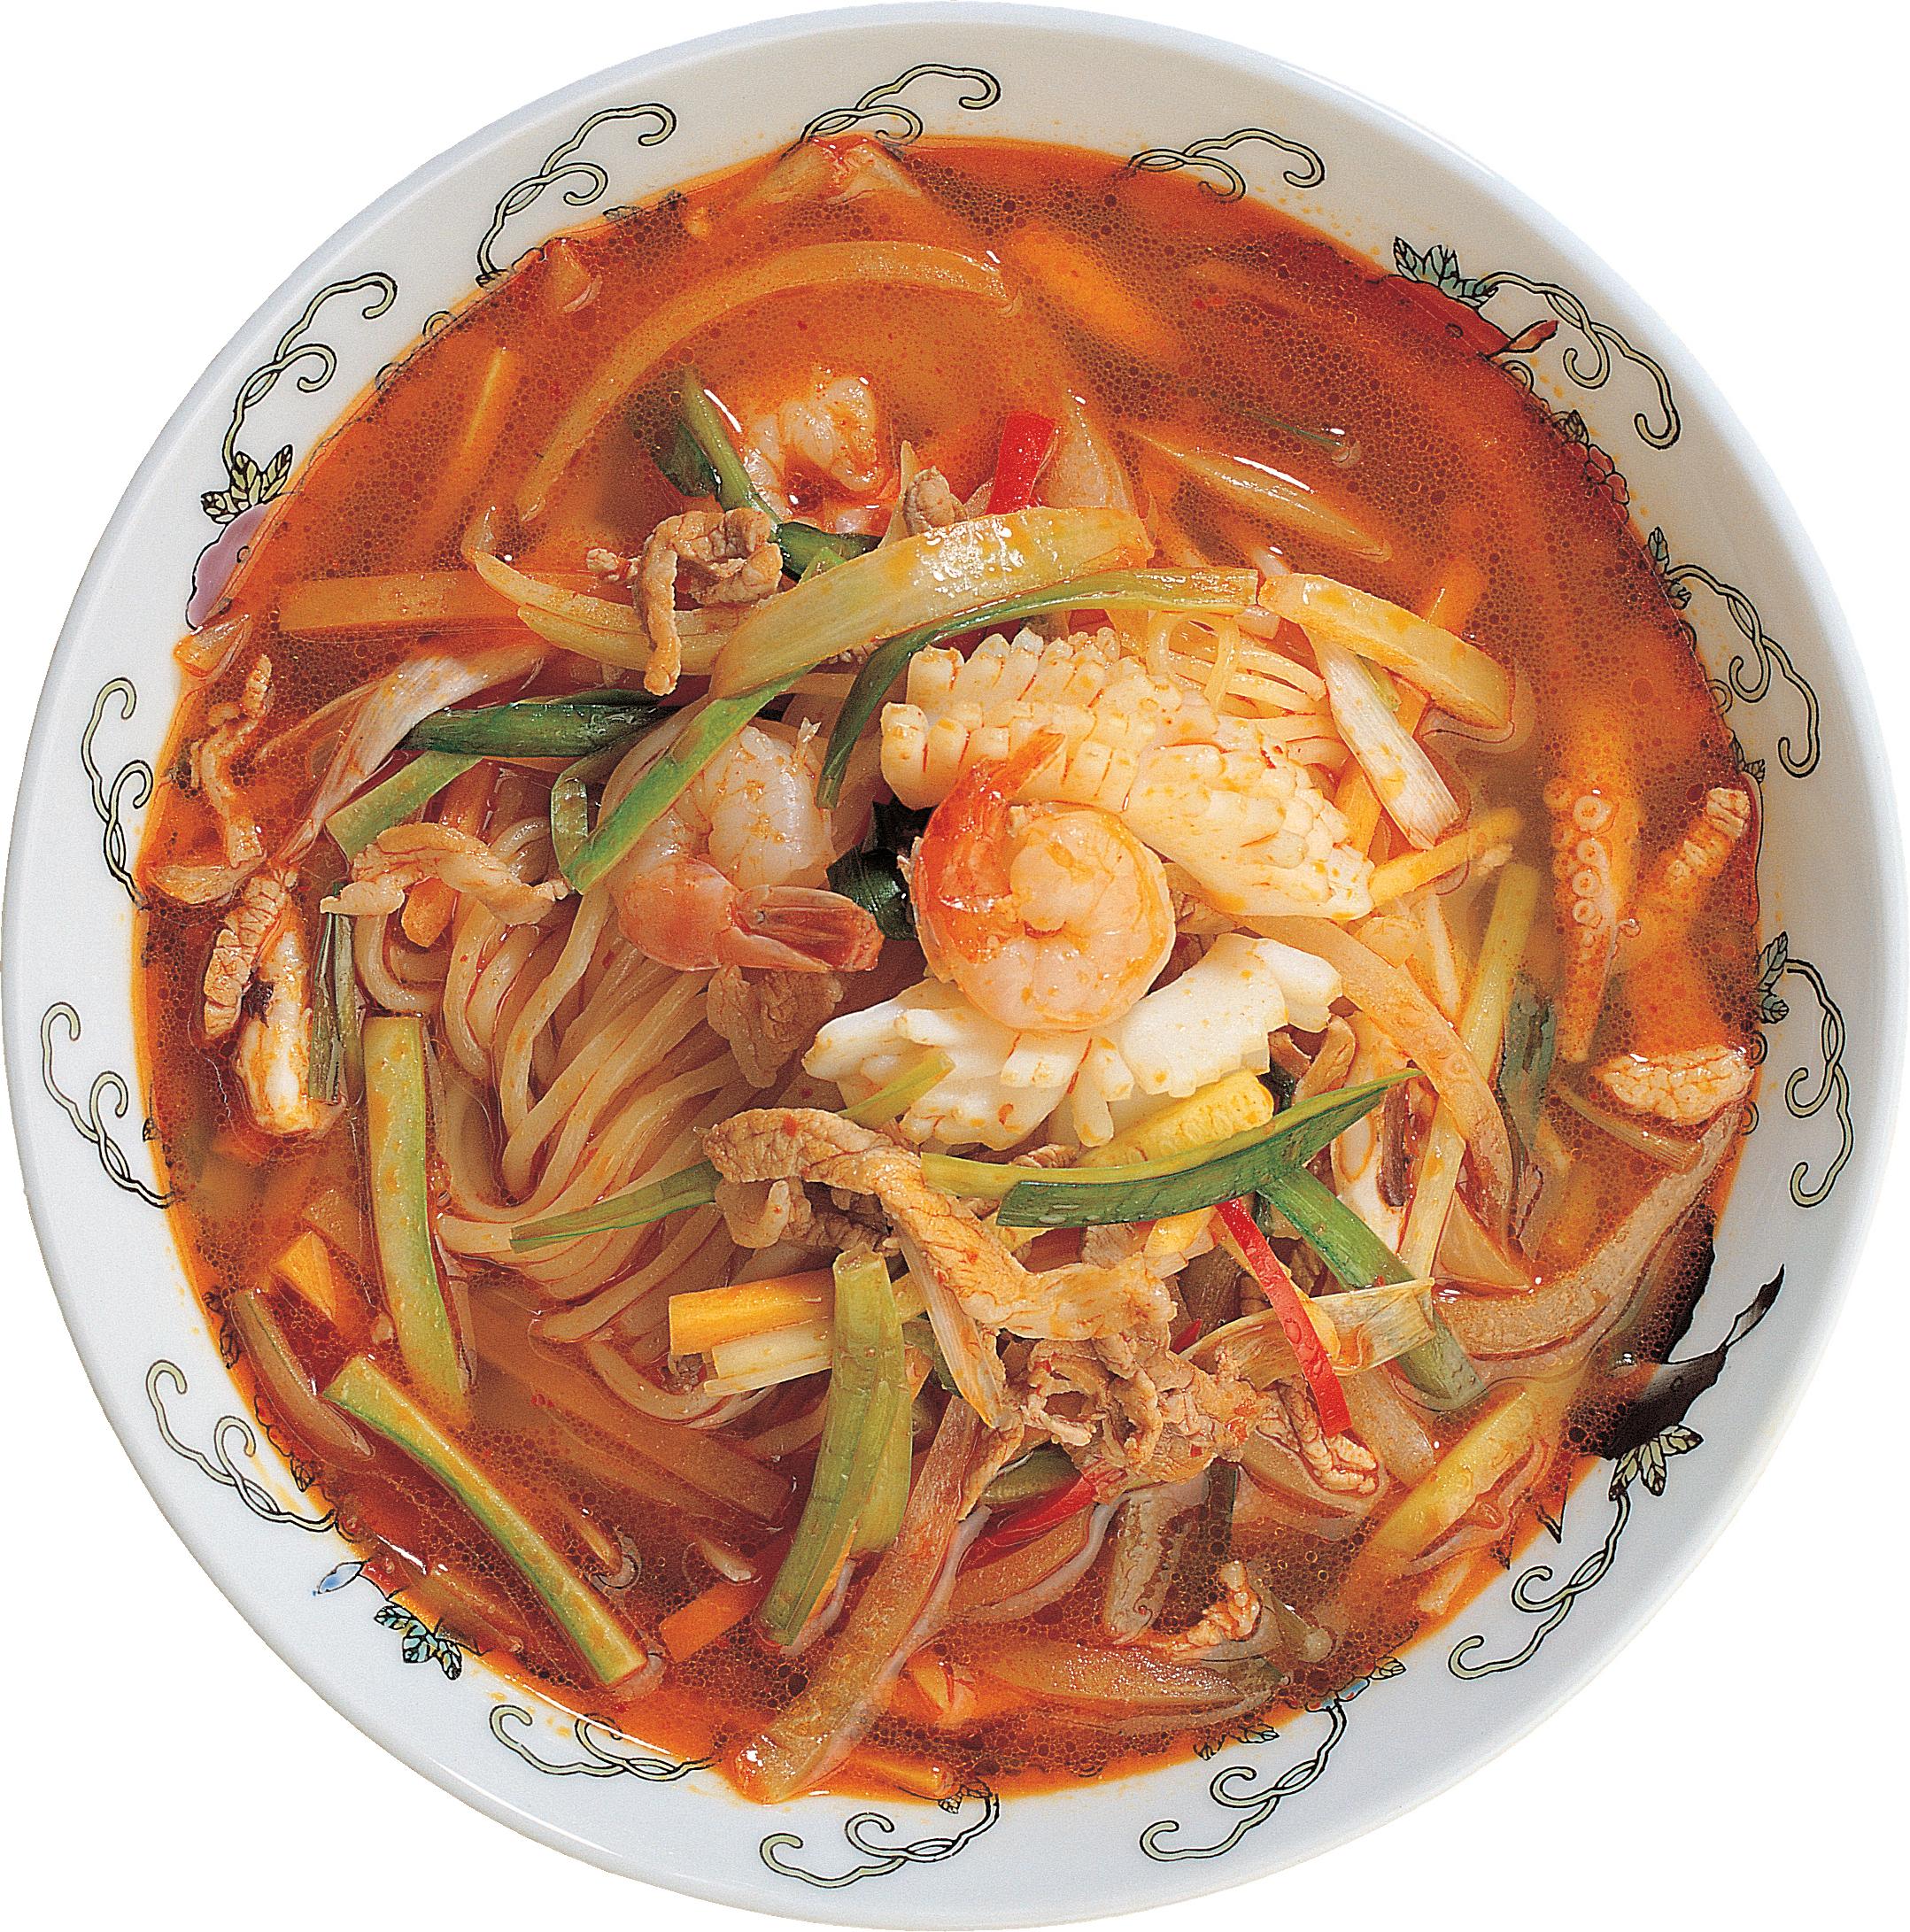 Soup PNG Image